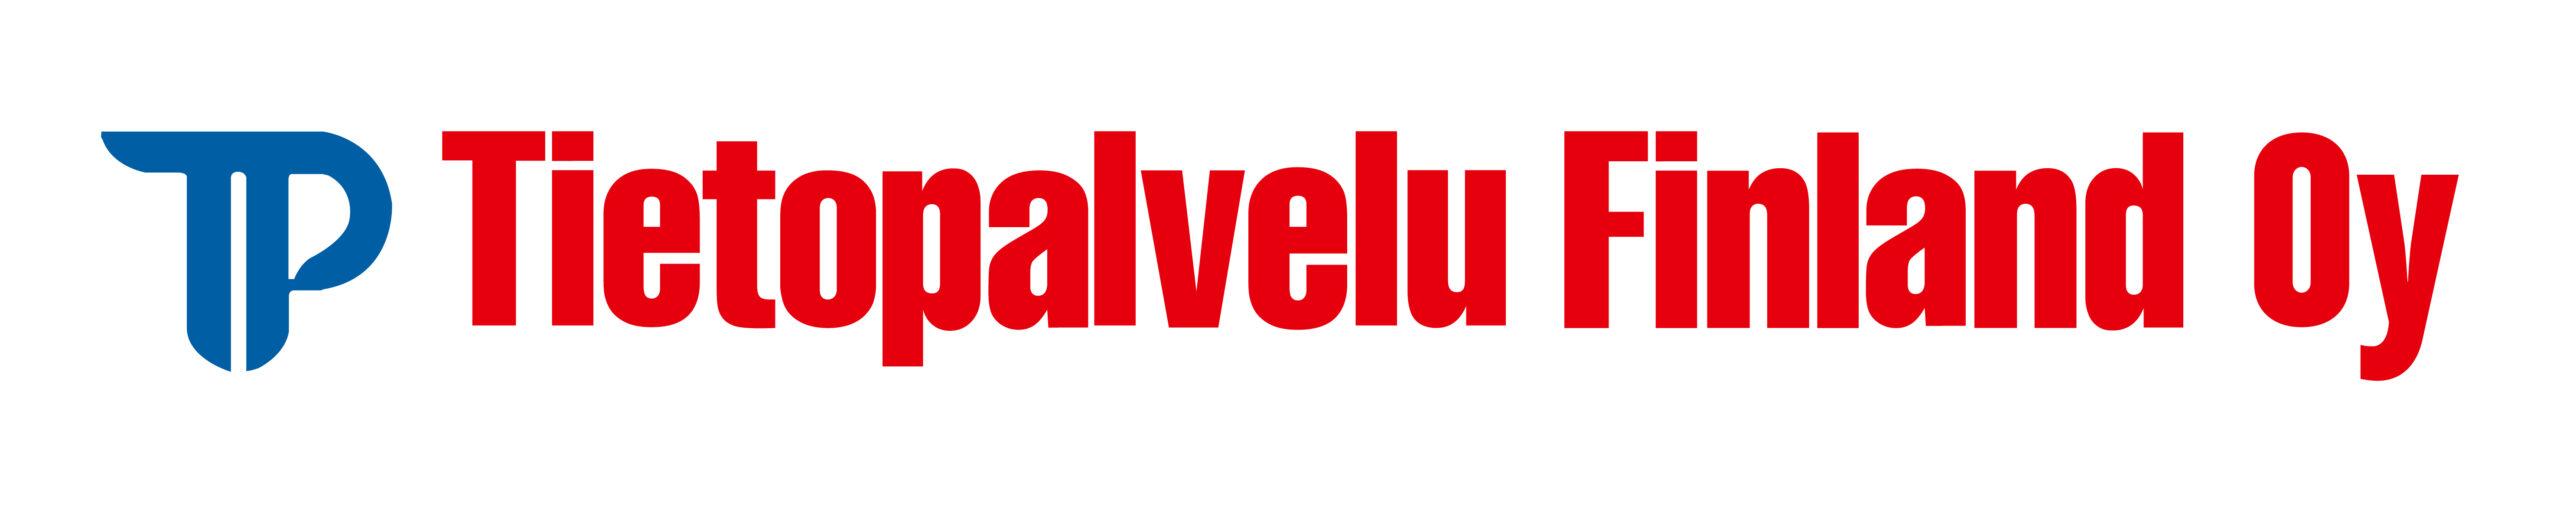 Tietopalvelu Finland Oy logo